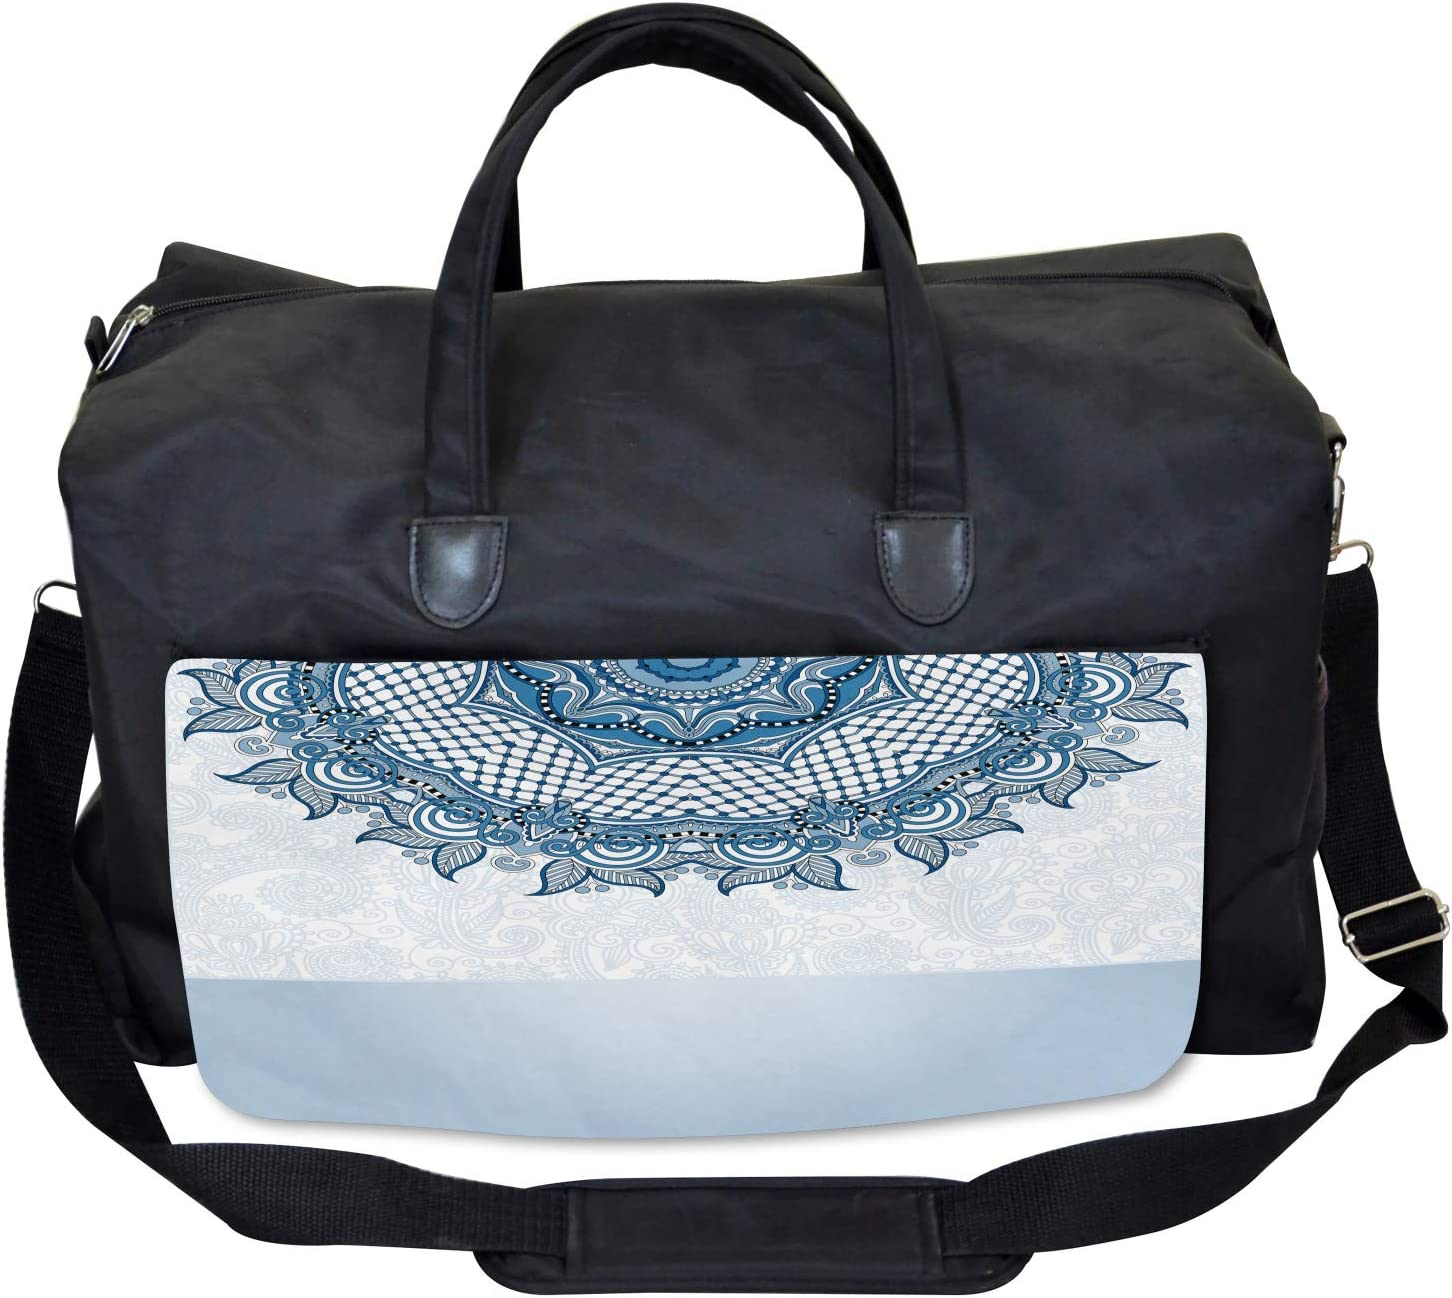 Ambesonne Vintage Gym Bag Large Weekender Carry-on Ethnic Lace Details